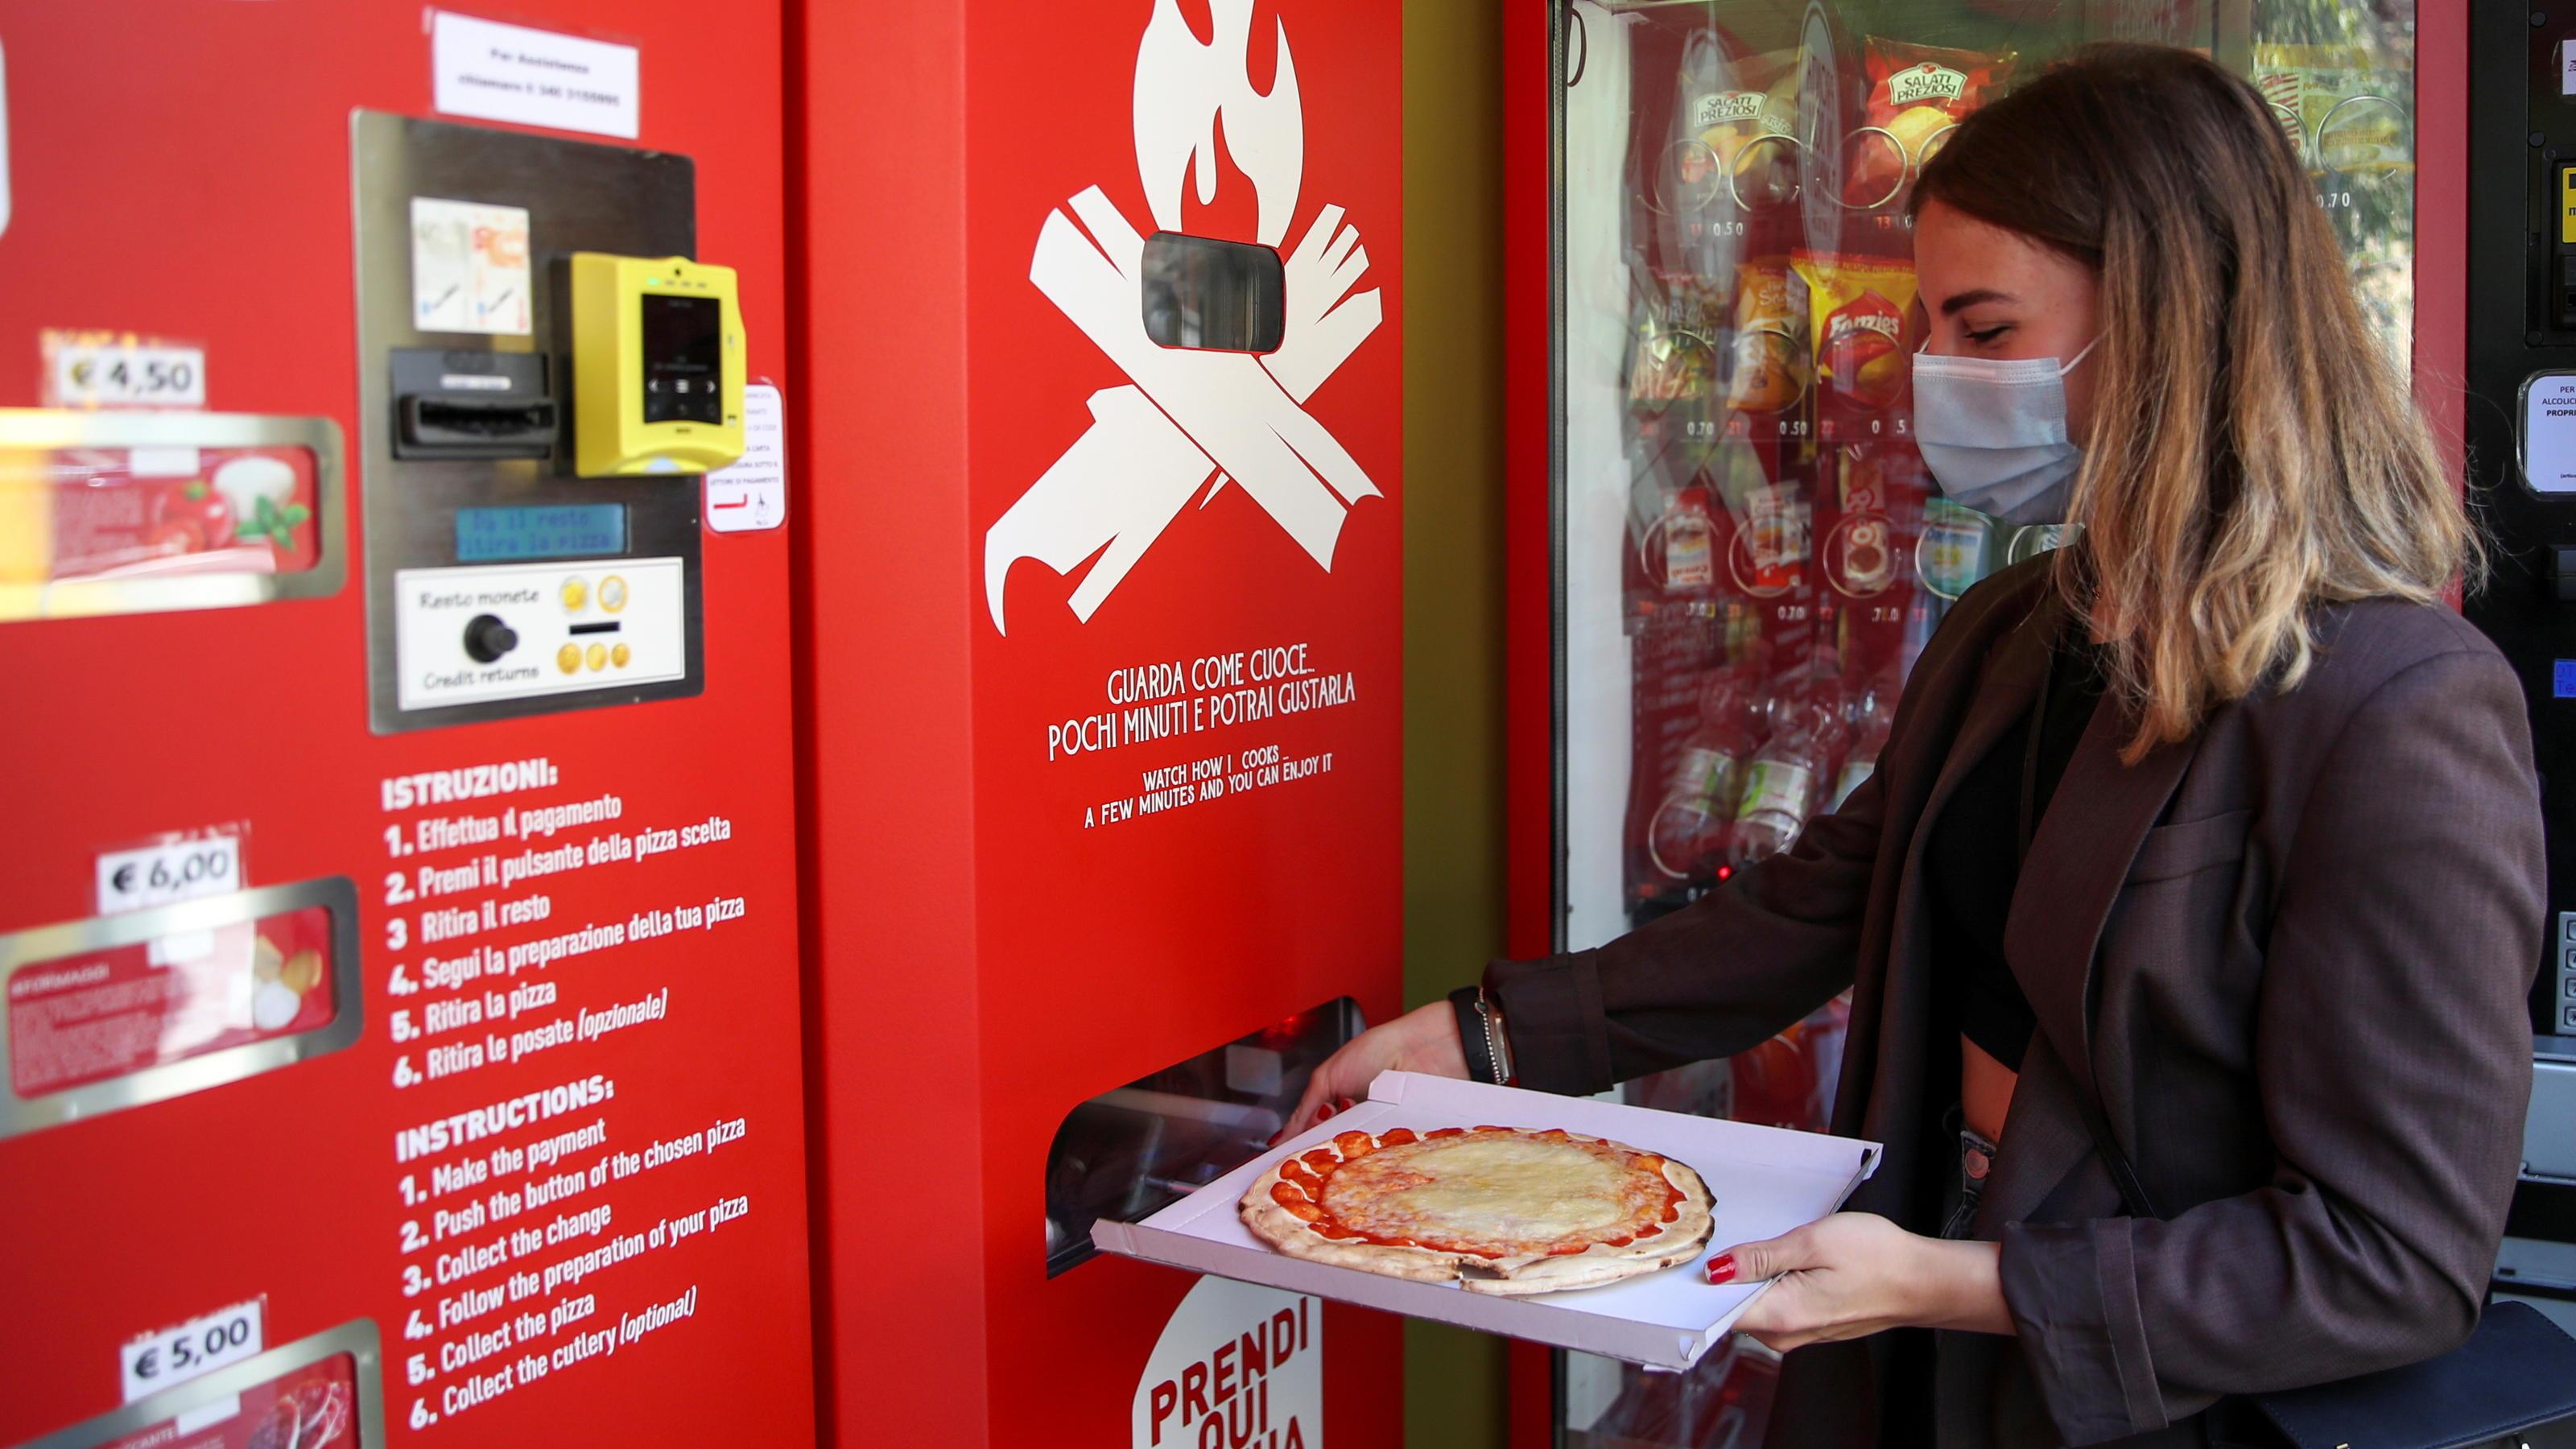 Mr. Go: SO schmeckt Pizza aus dem Automaten